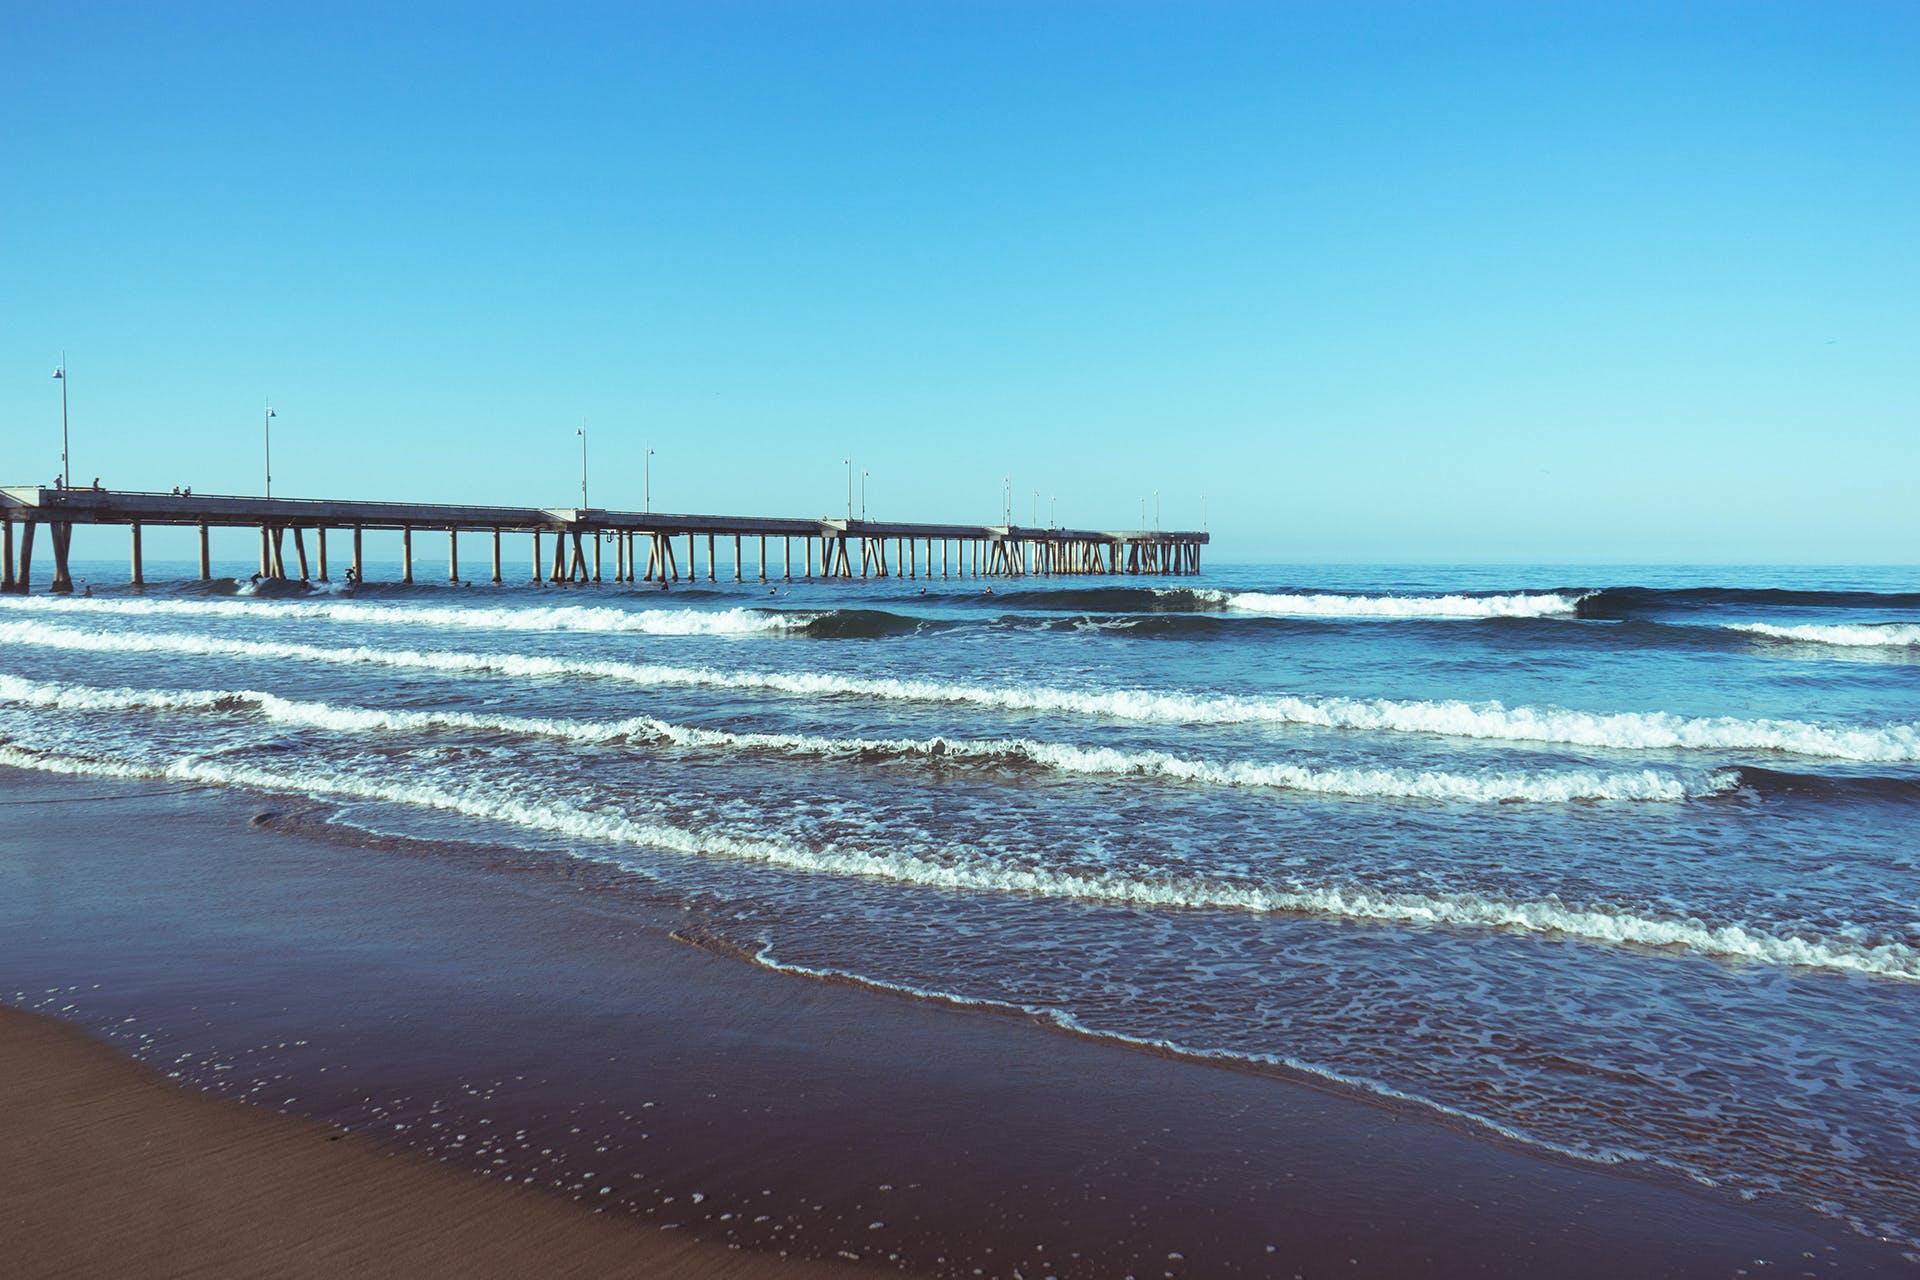 Gratis arkivbilde med brygge, bølger, landingsbrygge, sjø